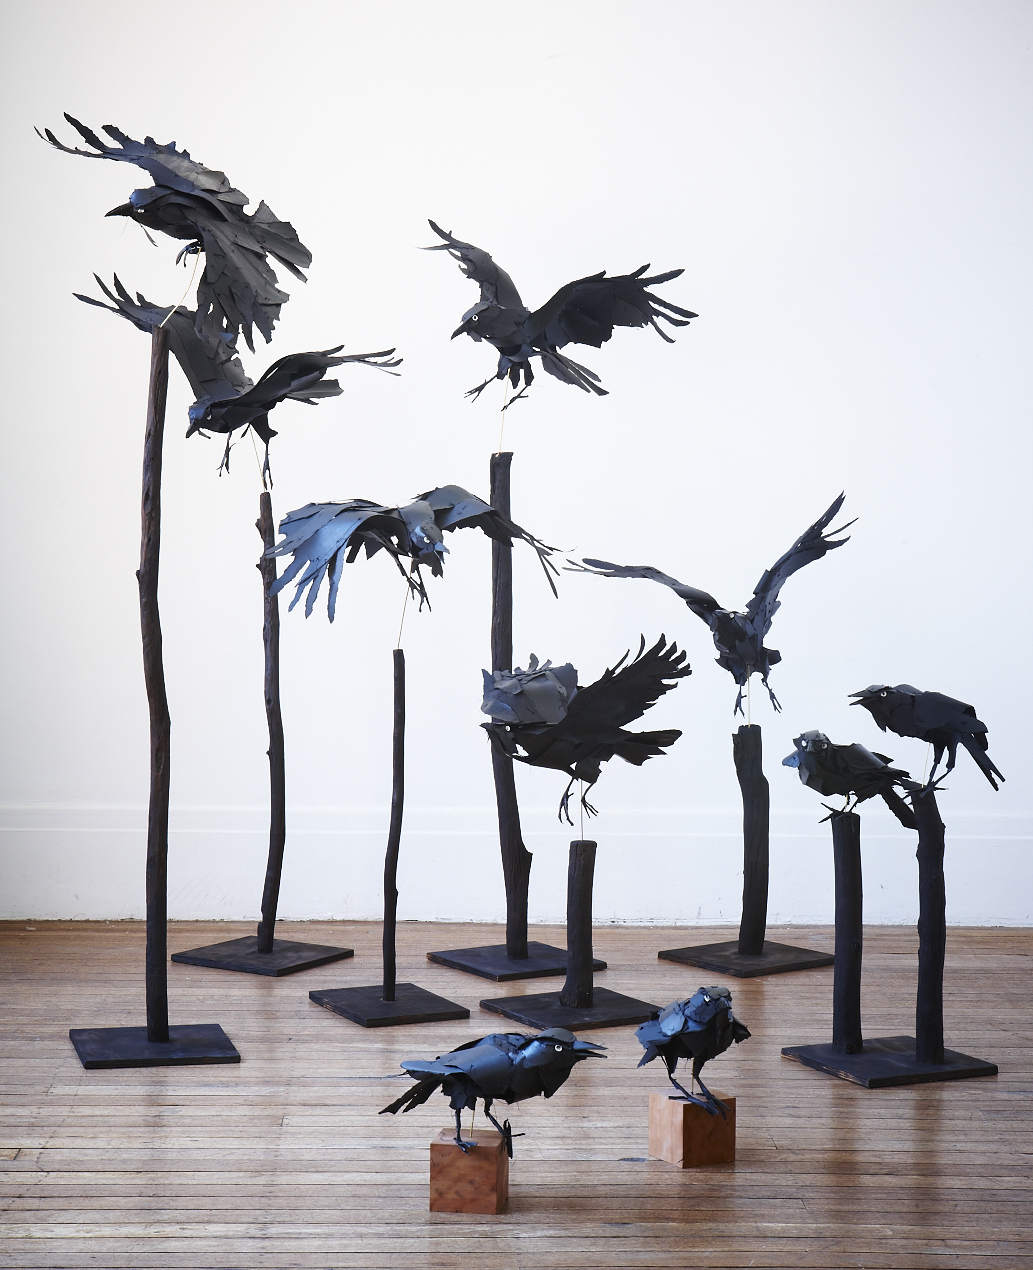 Ravens 2012 cotton rag, cotton thread, watercolour ink, brass rod  Image by Petrina Tinslay